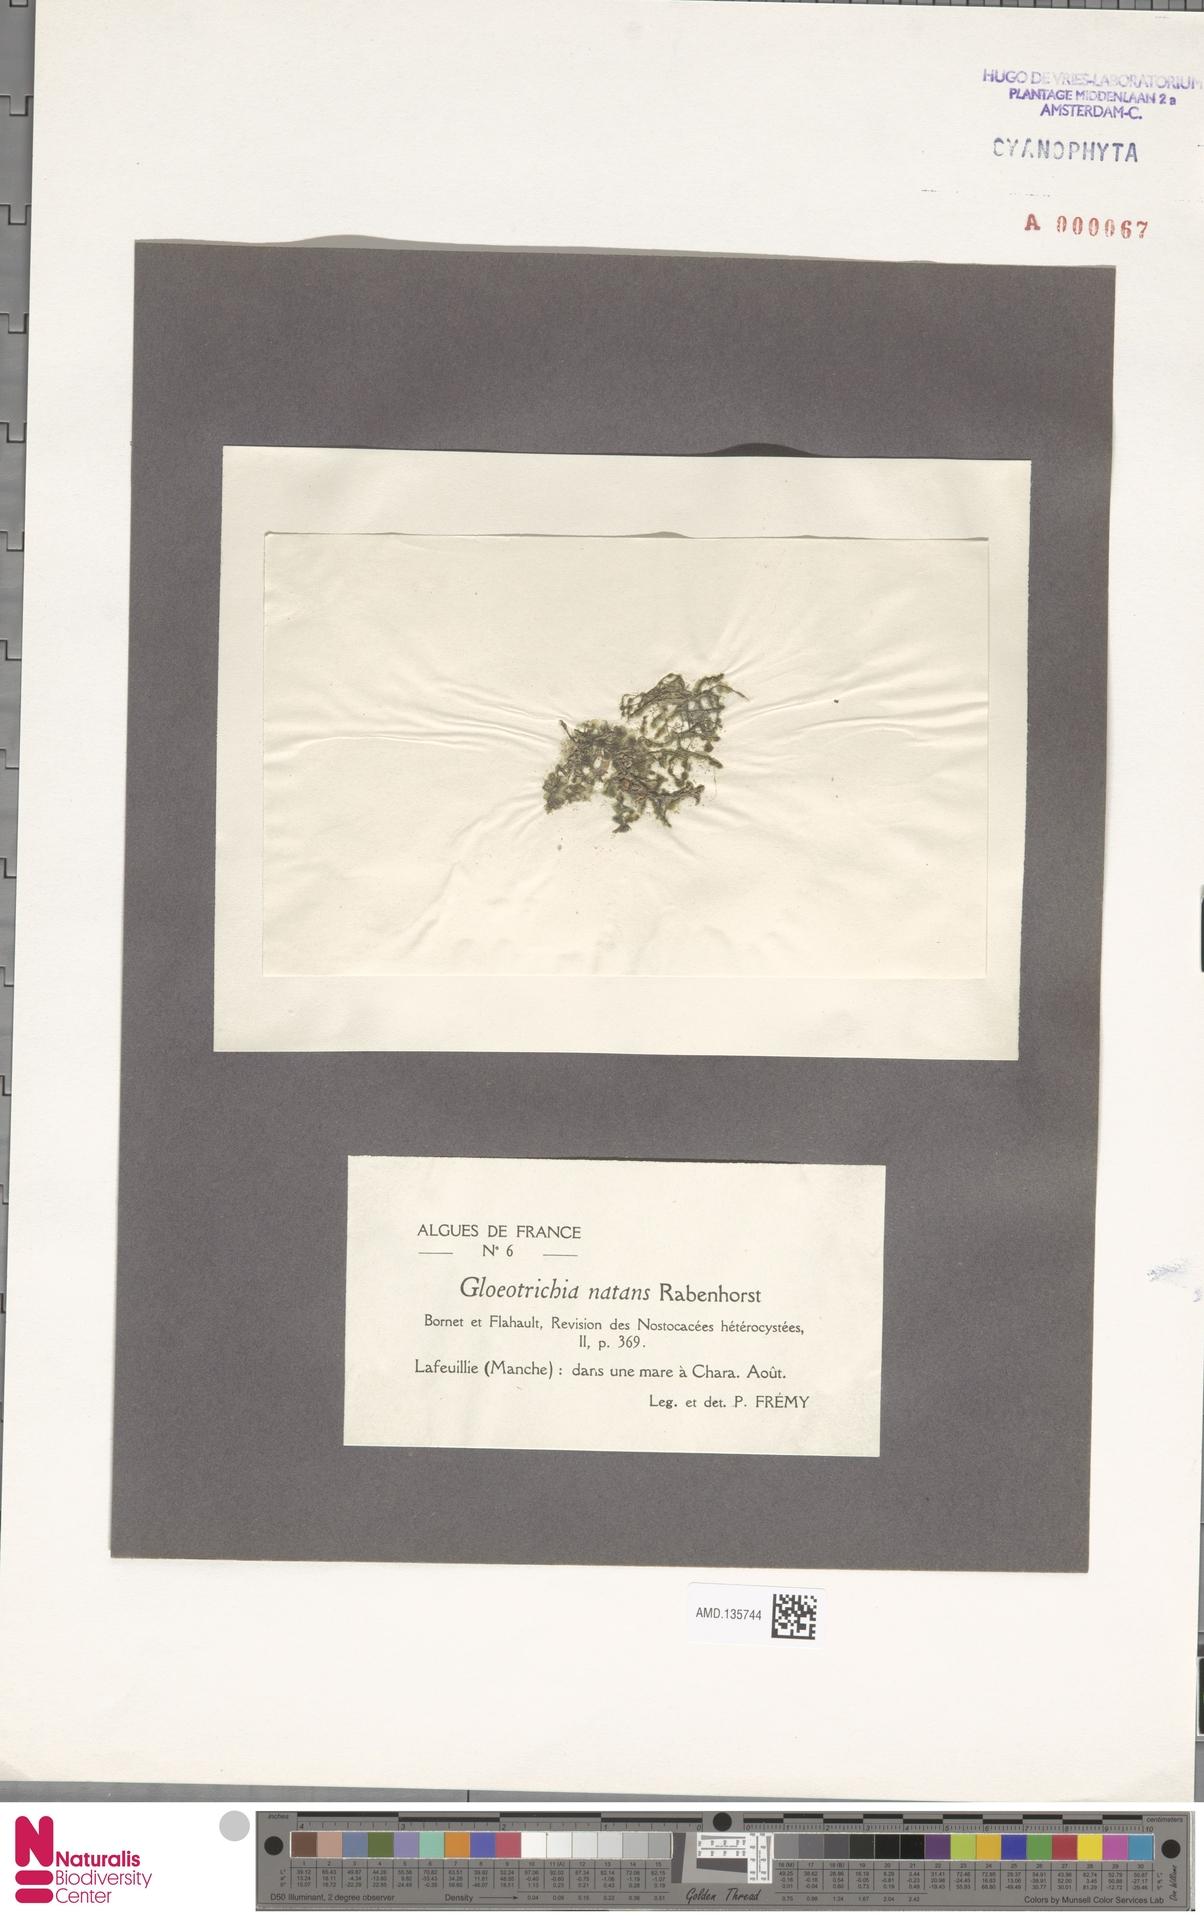 AMD.135744   Gloeotrichia natans (Hedw.) Rabenh. ex Bornet & Flahault